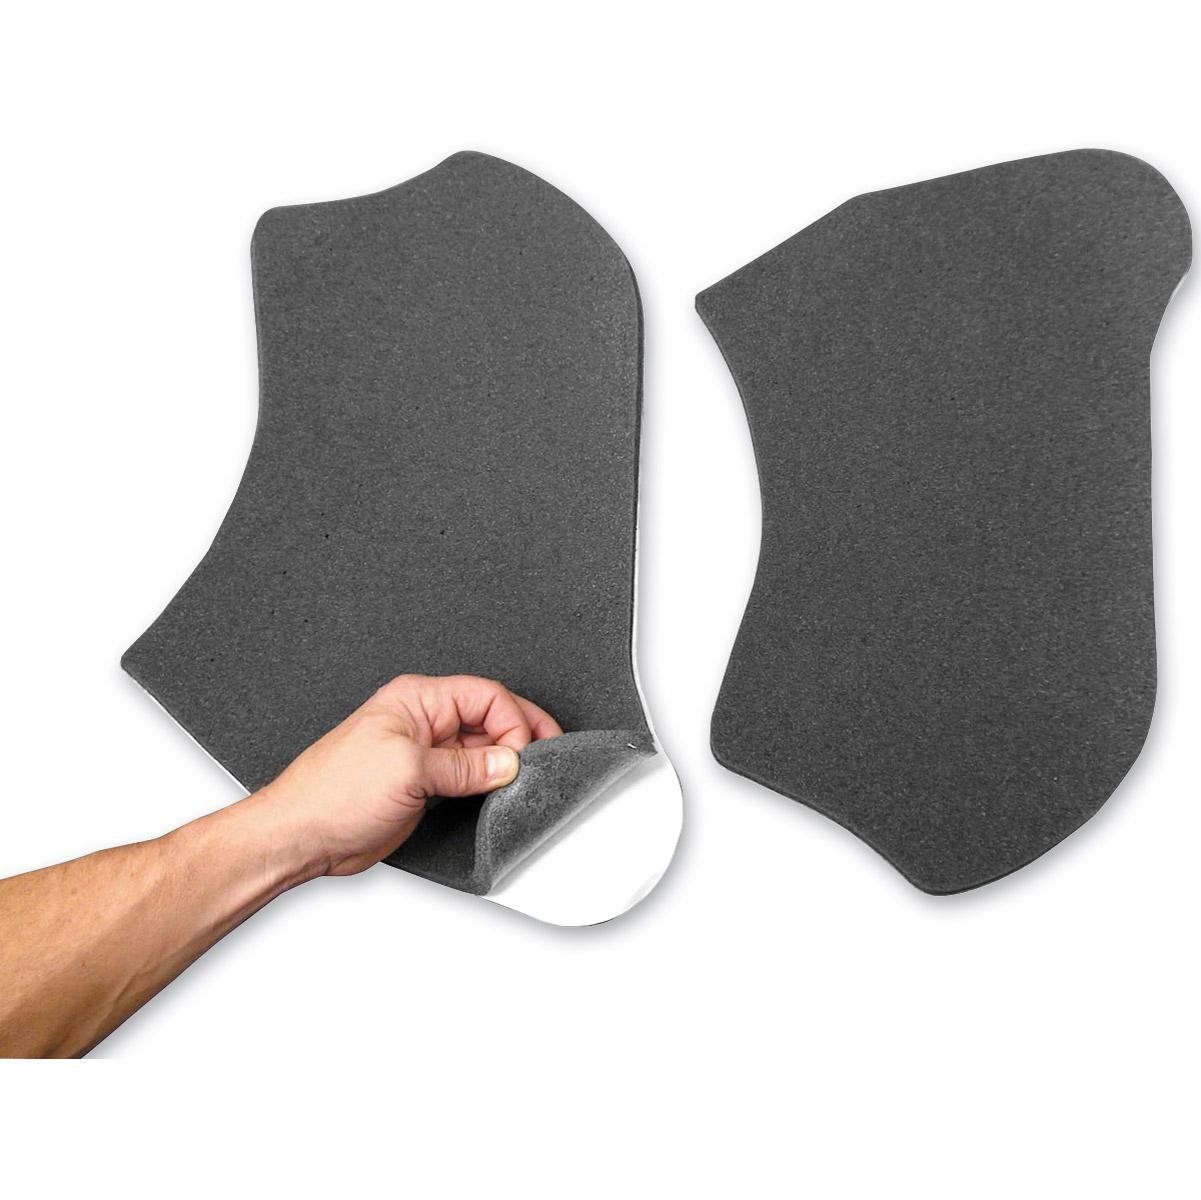 J&M Fairing/Speaker Acoustic Pads for Electra or Street Glide